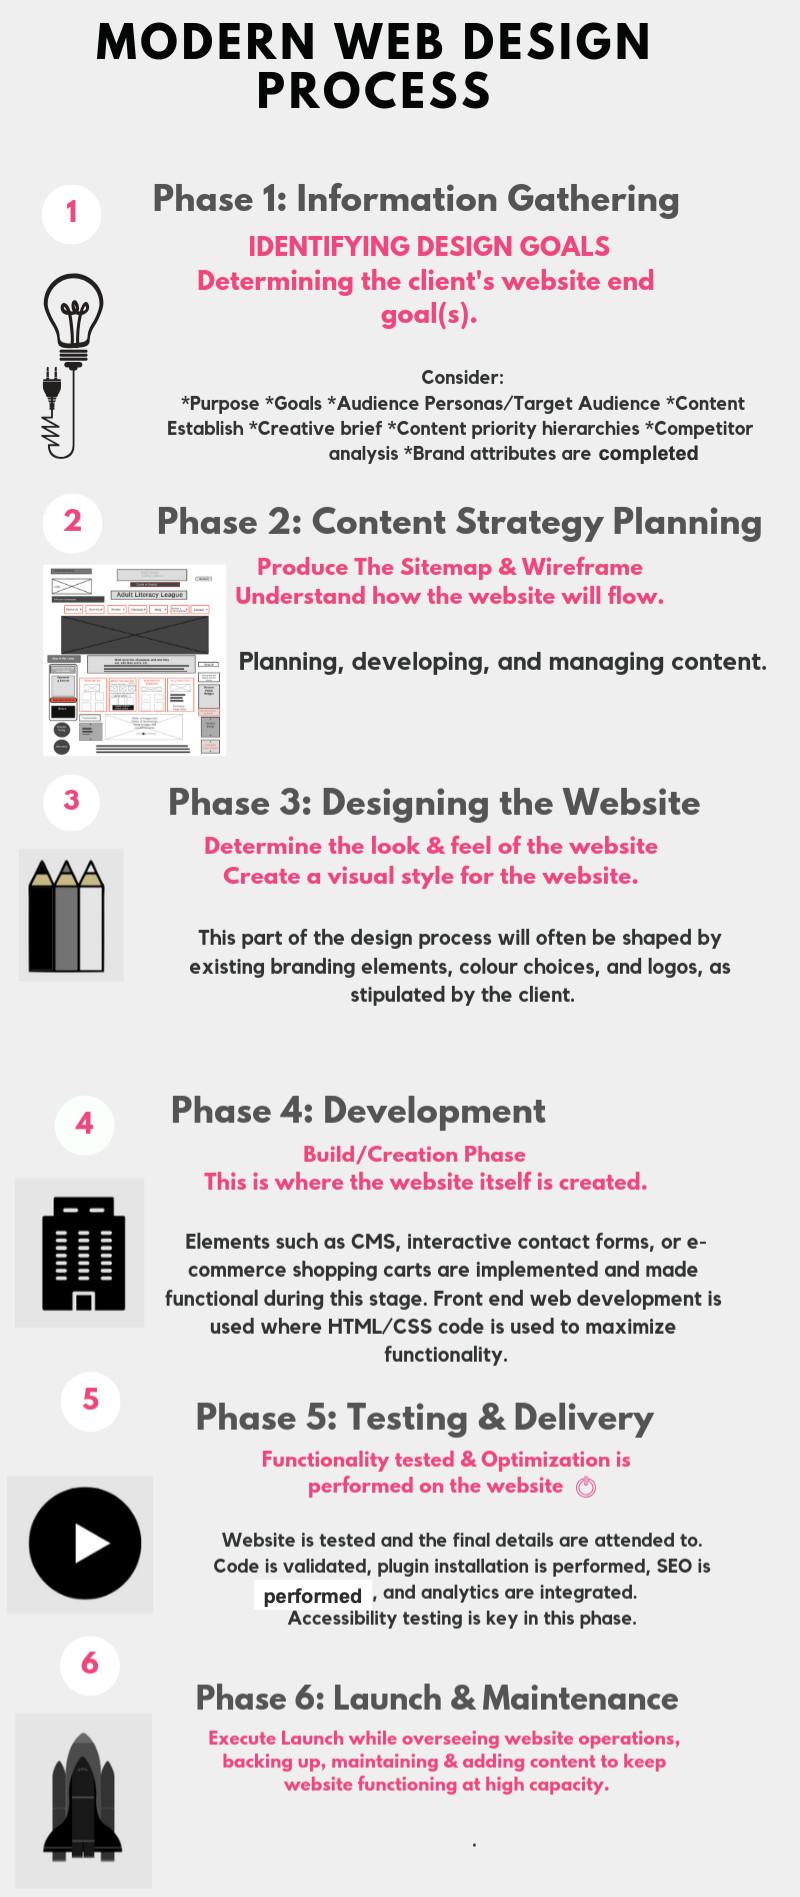 Modern Web Design Process Infographic via Jess Gold - JG Marketing Design